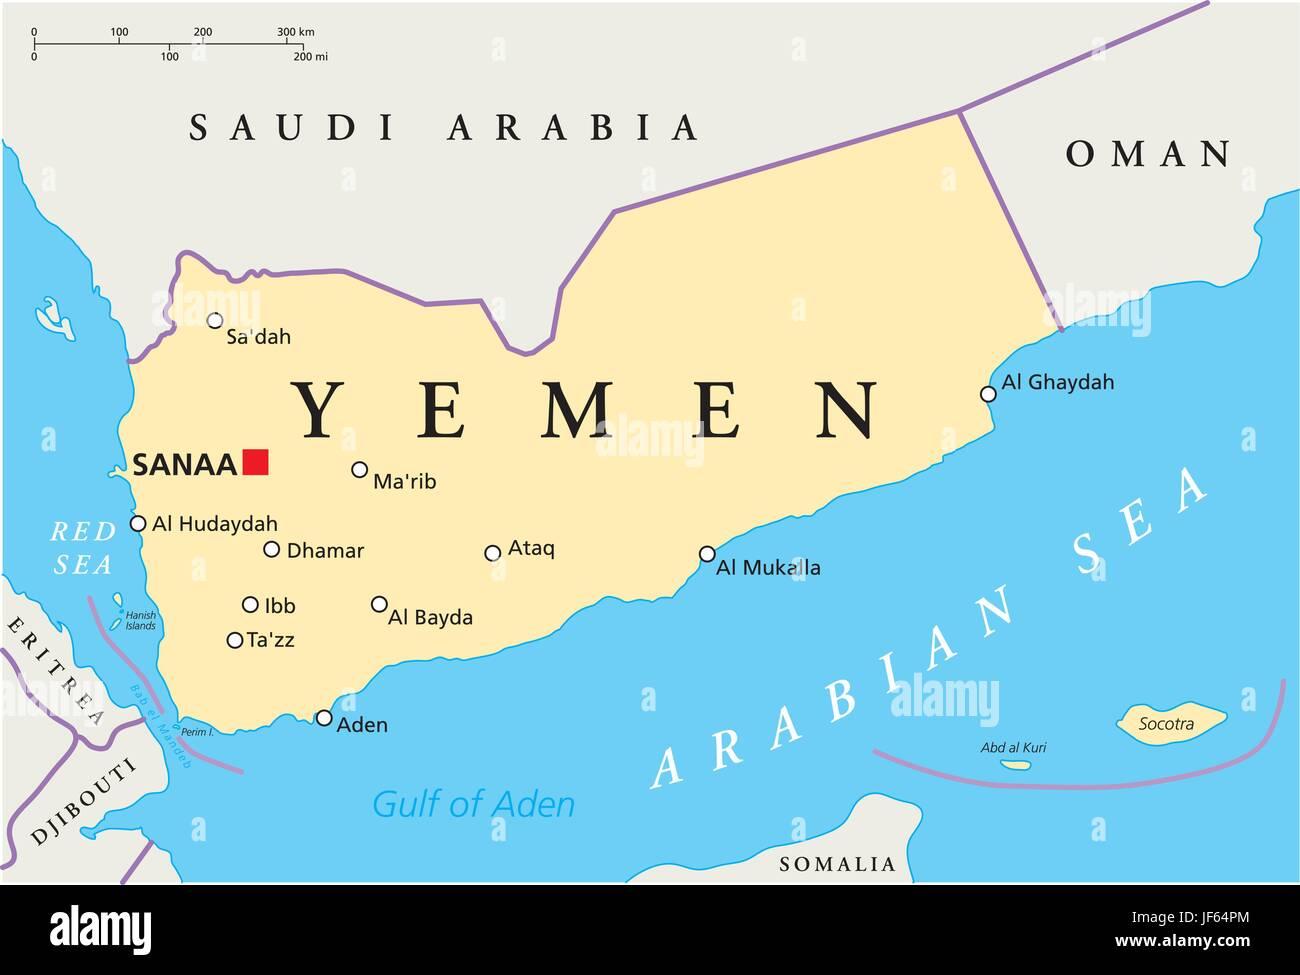 Yemen World Map on oman world map, somalia world map, vatican world map, syria world map, ethiopia world map, middle east map, afghanistan world map, sierra leone world map, macau world map, israel world map, saudi arabia world map, ghana world map, sudan world map, vietnam world map, eastern hemisphere world map, mecca world map, iraq world map, azerbaijan world map, united arab emirates world map, india world map,